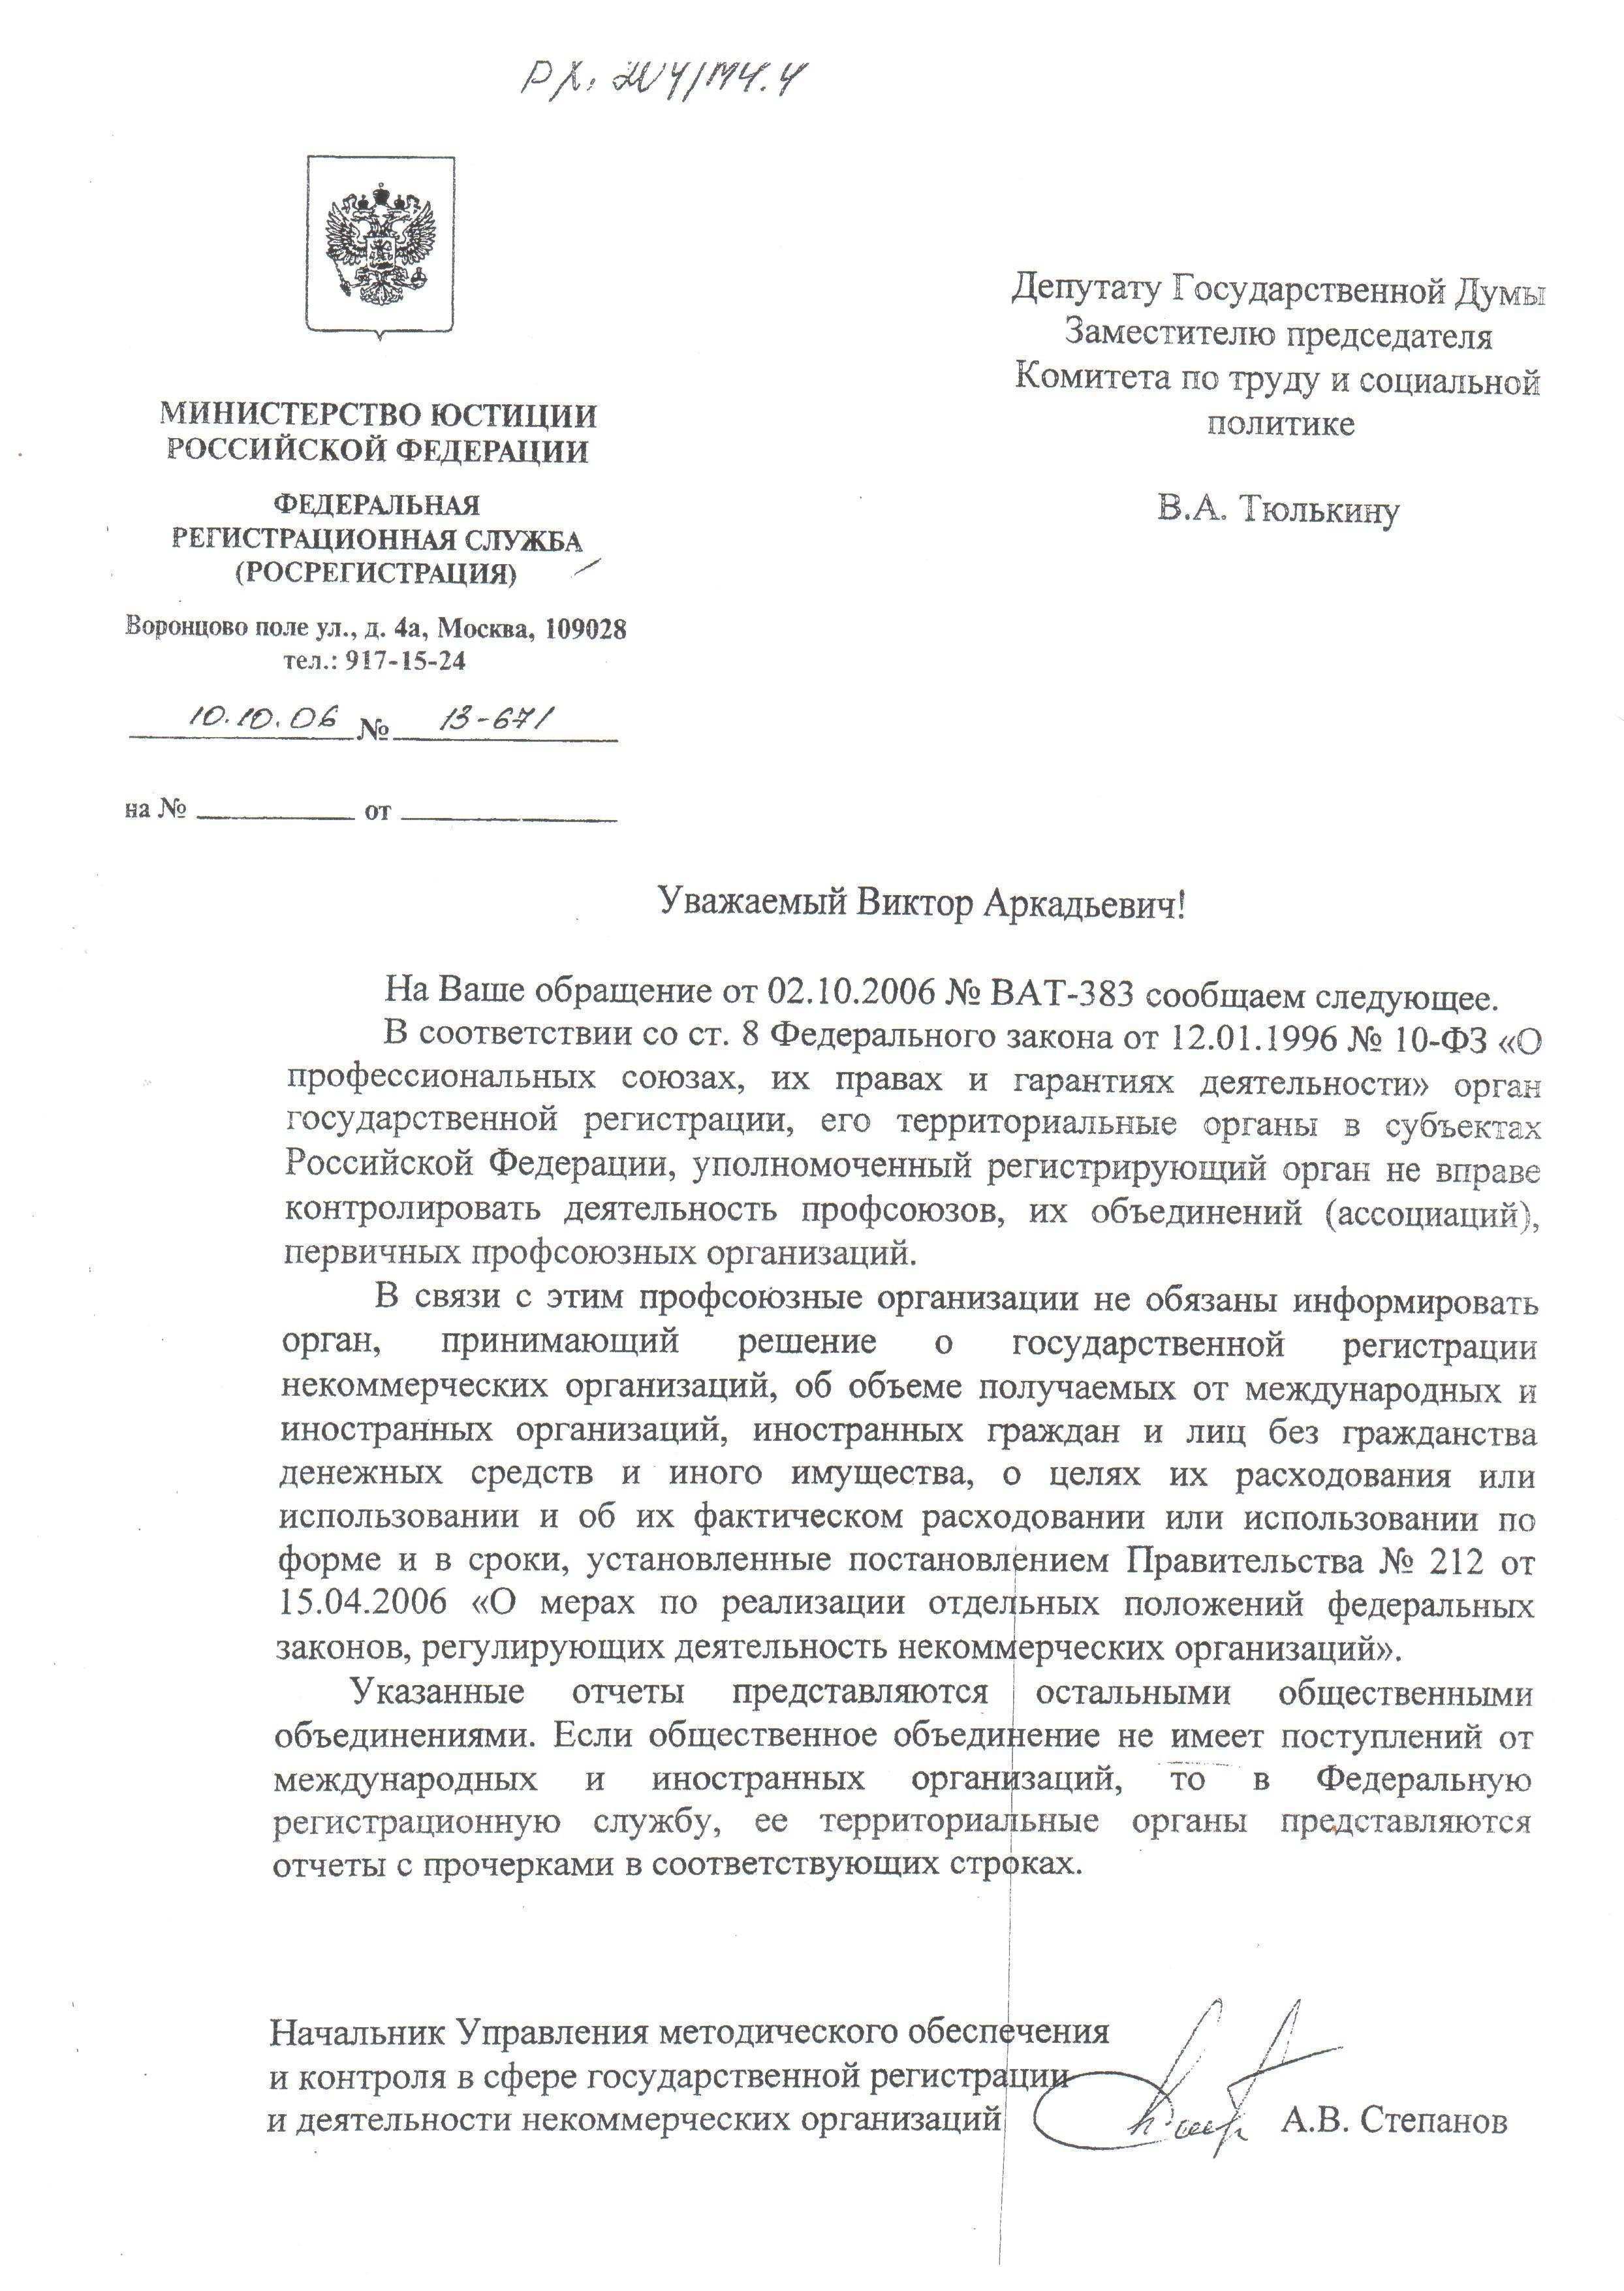 МПРА Степанов-Тюлькин.jpg